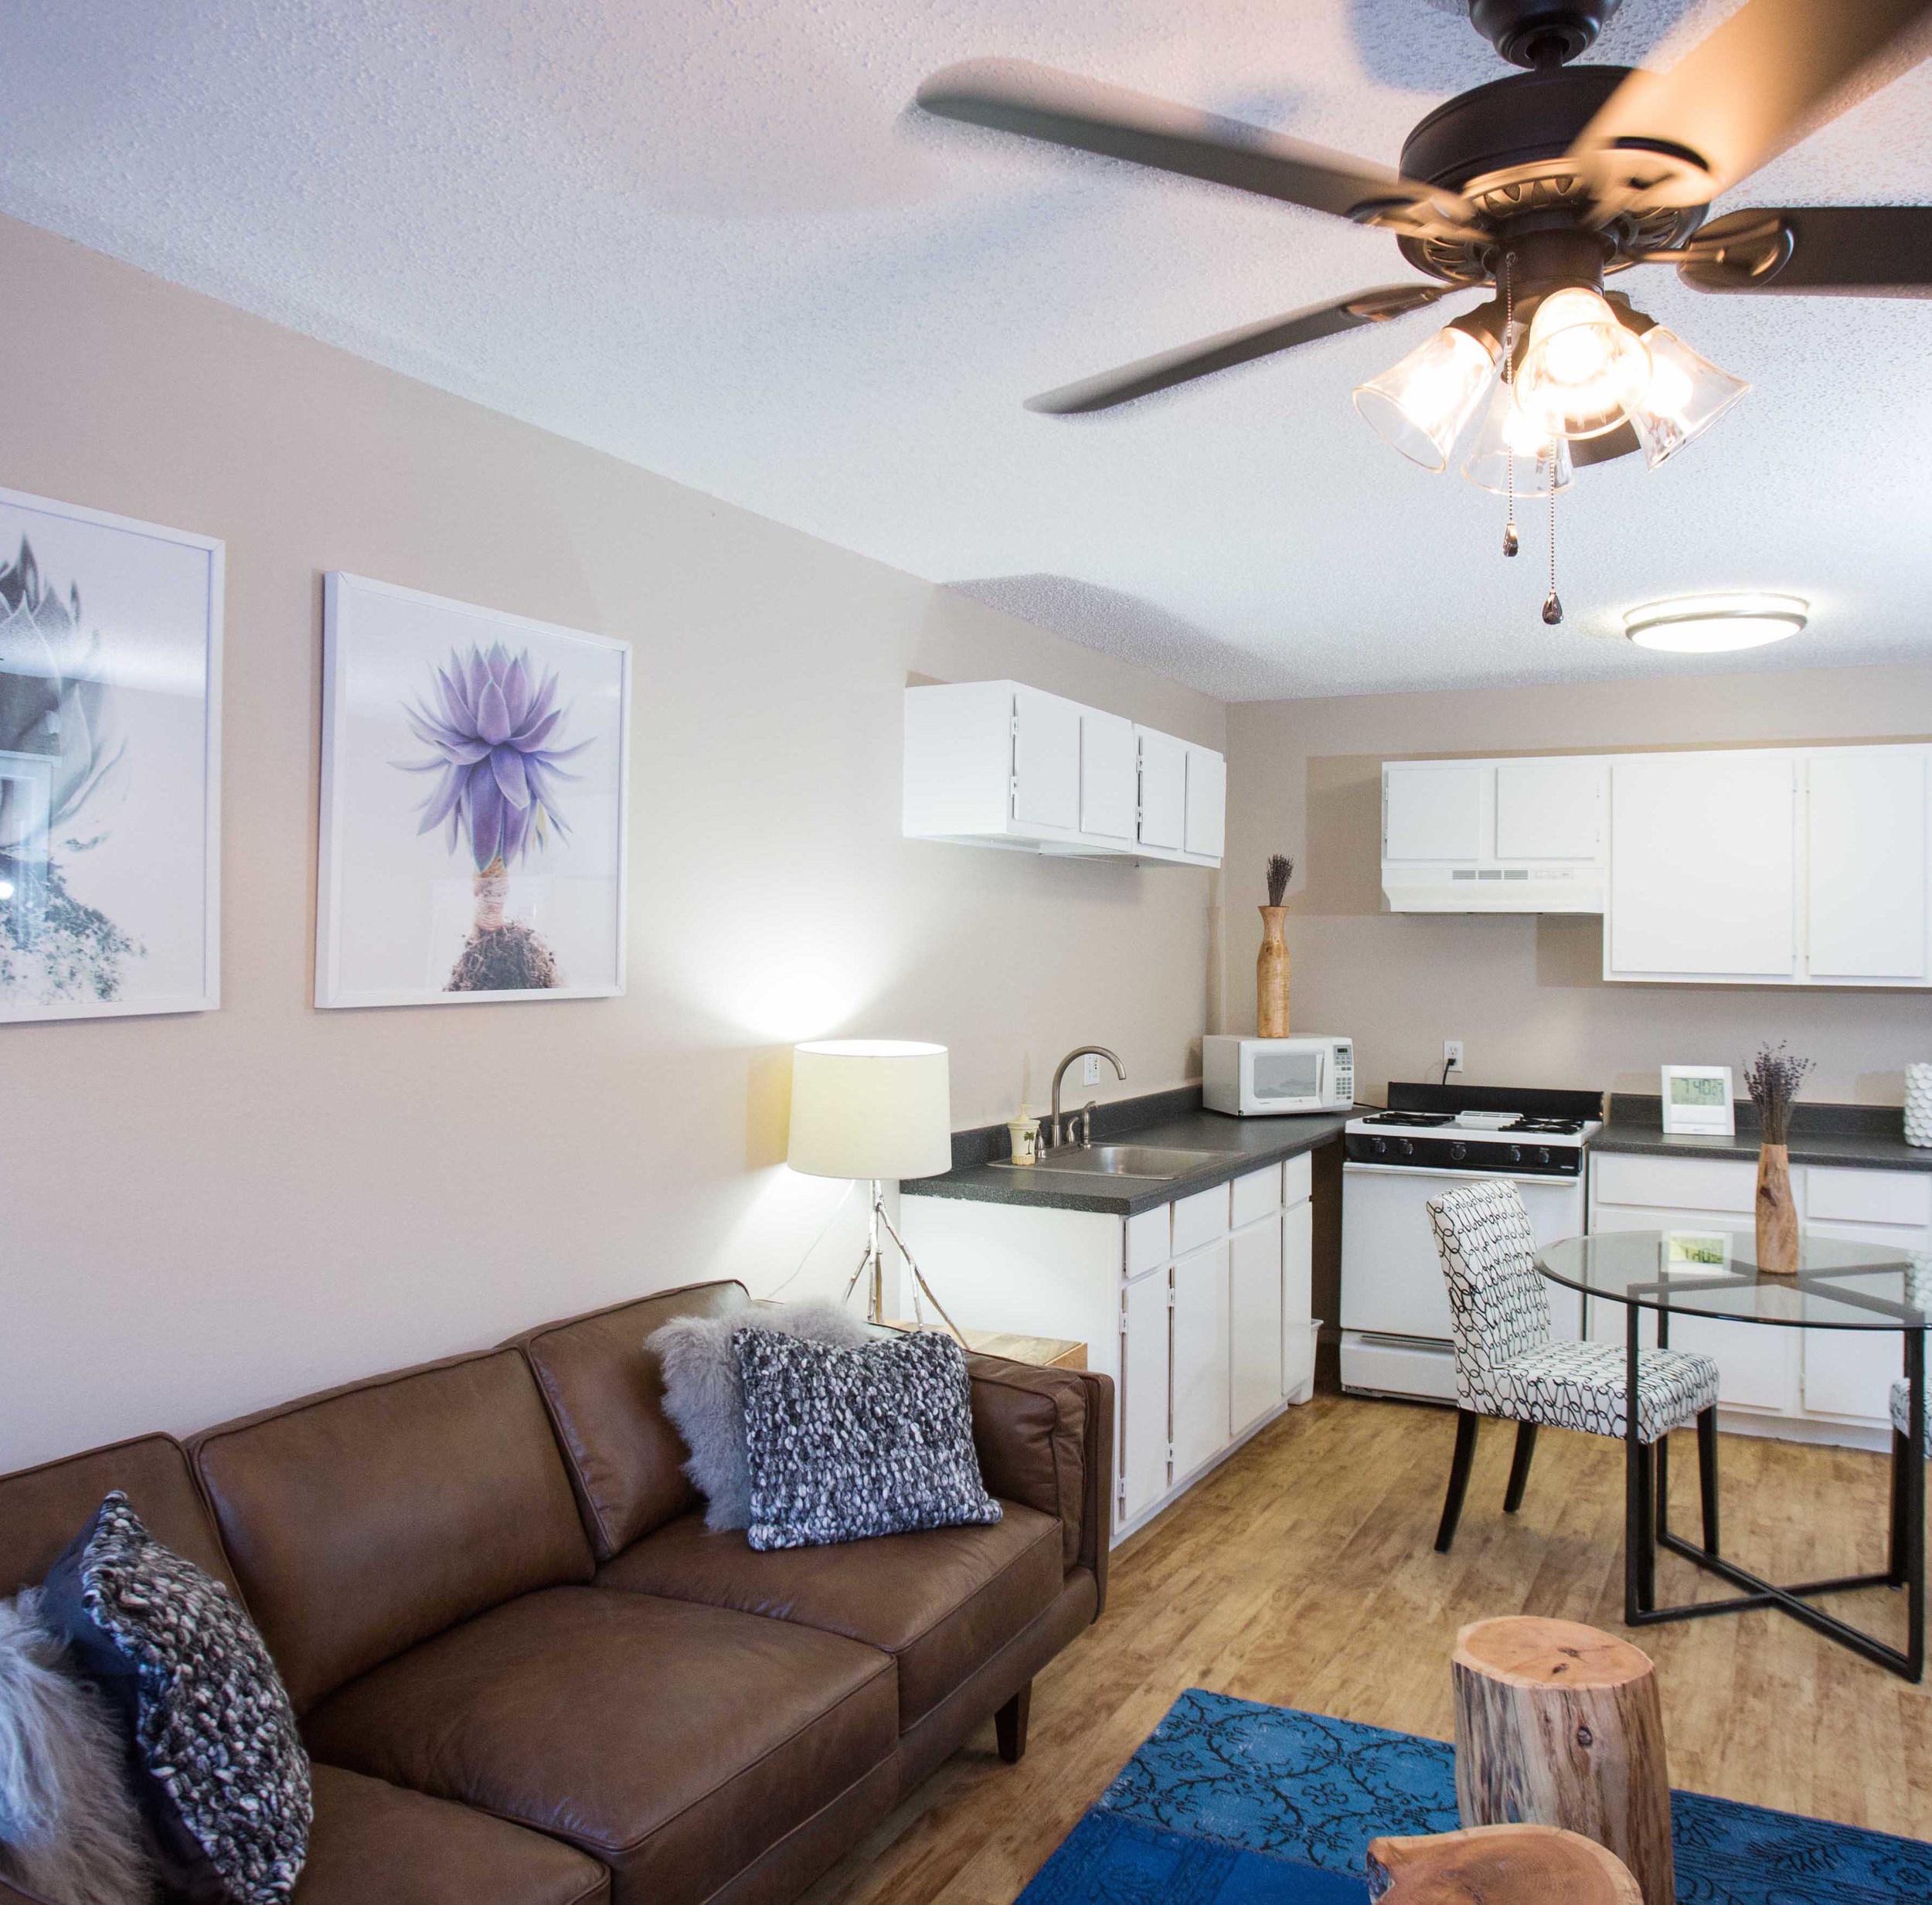 1/1 - $1250 - Reduced Rates   Austin, Texas 78701  625 square feet